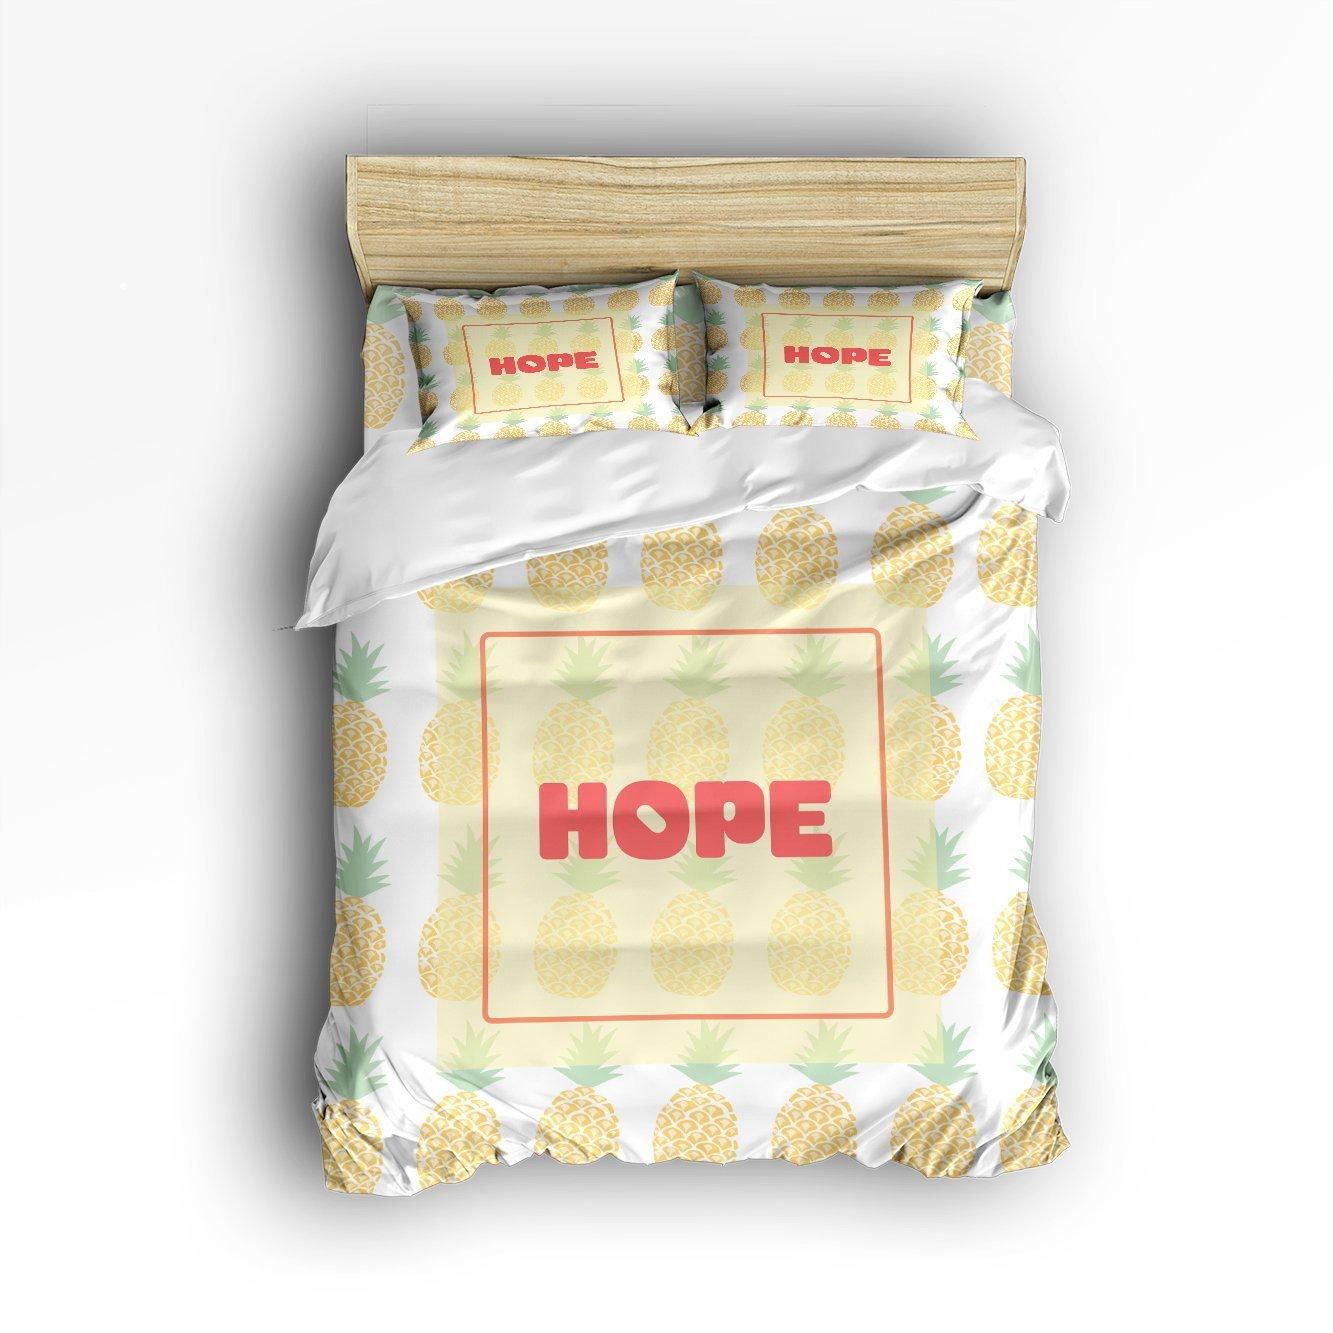 KAROLA Lightweight Microfiber Duvet Cover Set Luxury Soft Duvet Cover Set - Hotel Quality & Hypoallergenic with Zippered Closure HOPE